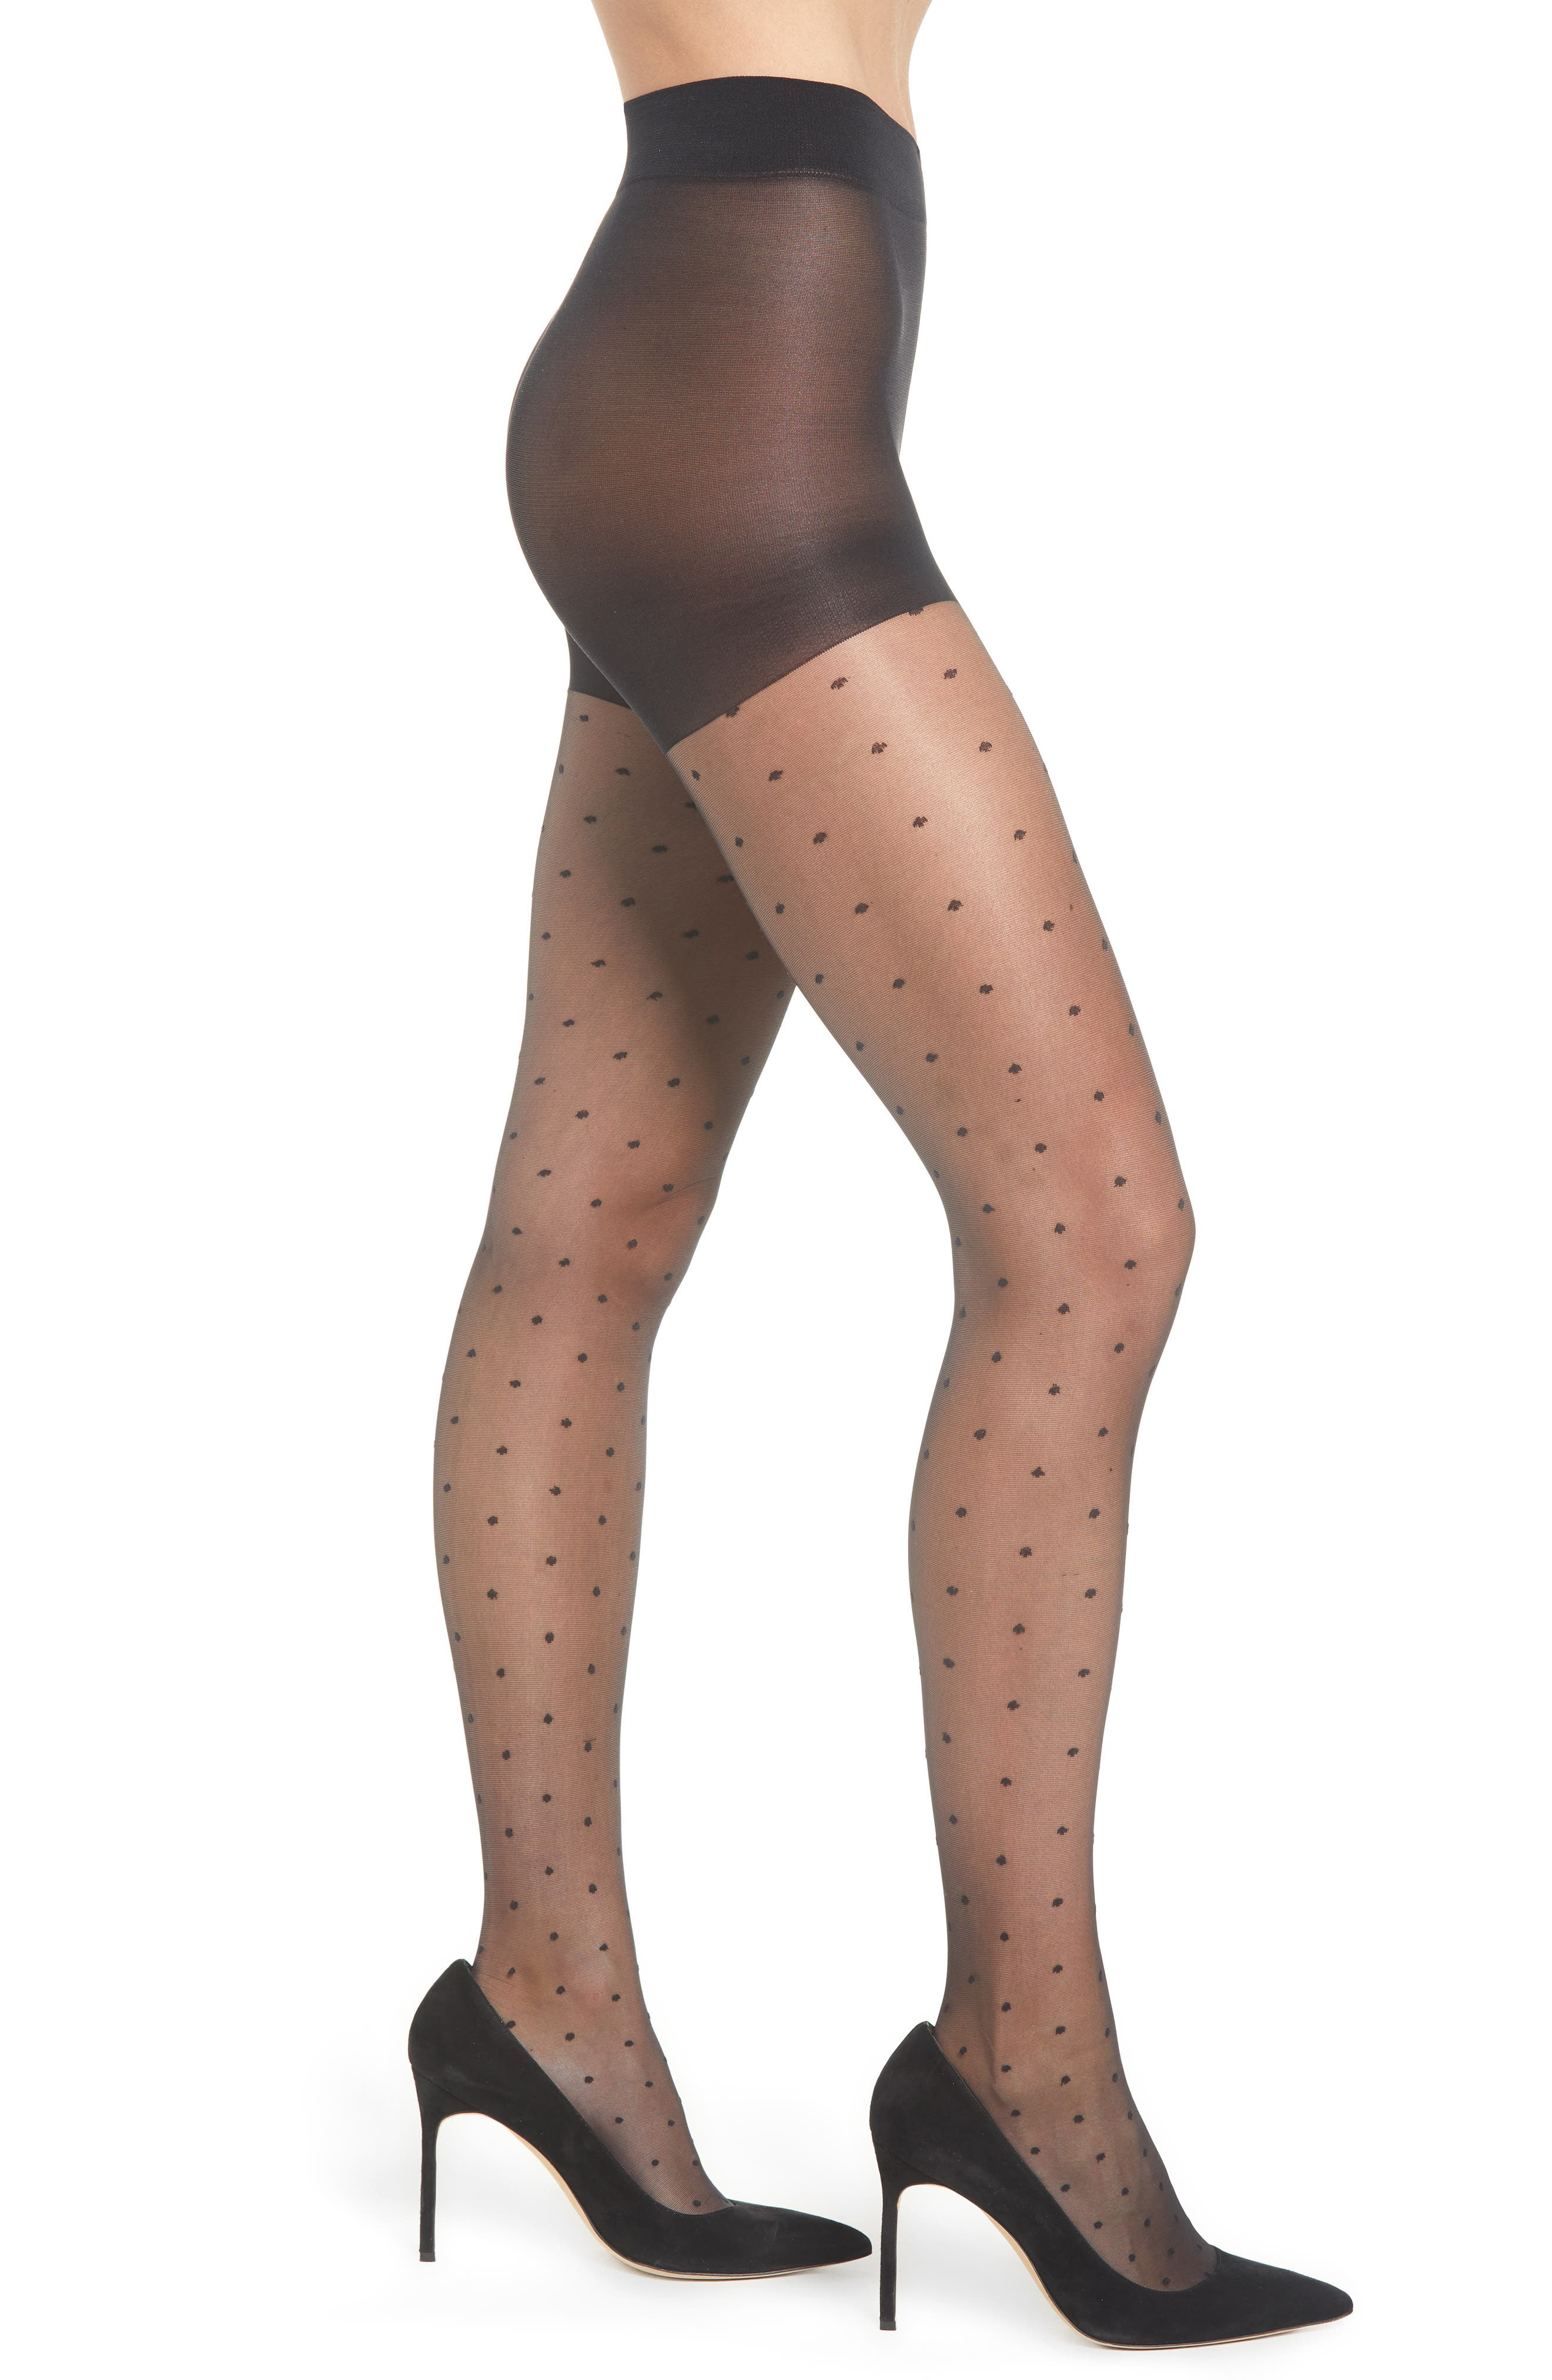 NORDSTROM 'Sheer Dot' Control Top Pantyhose, Main, color, 001